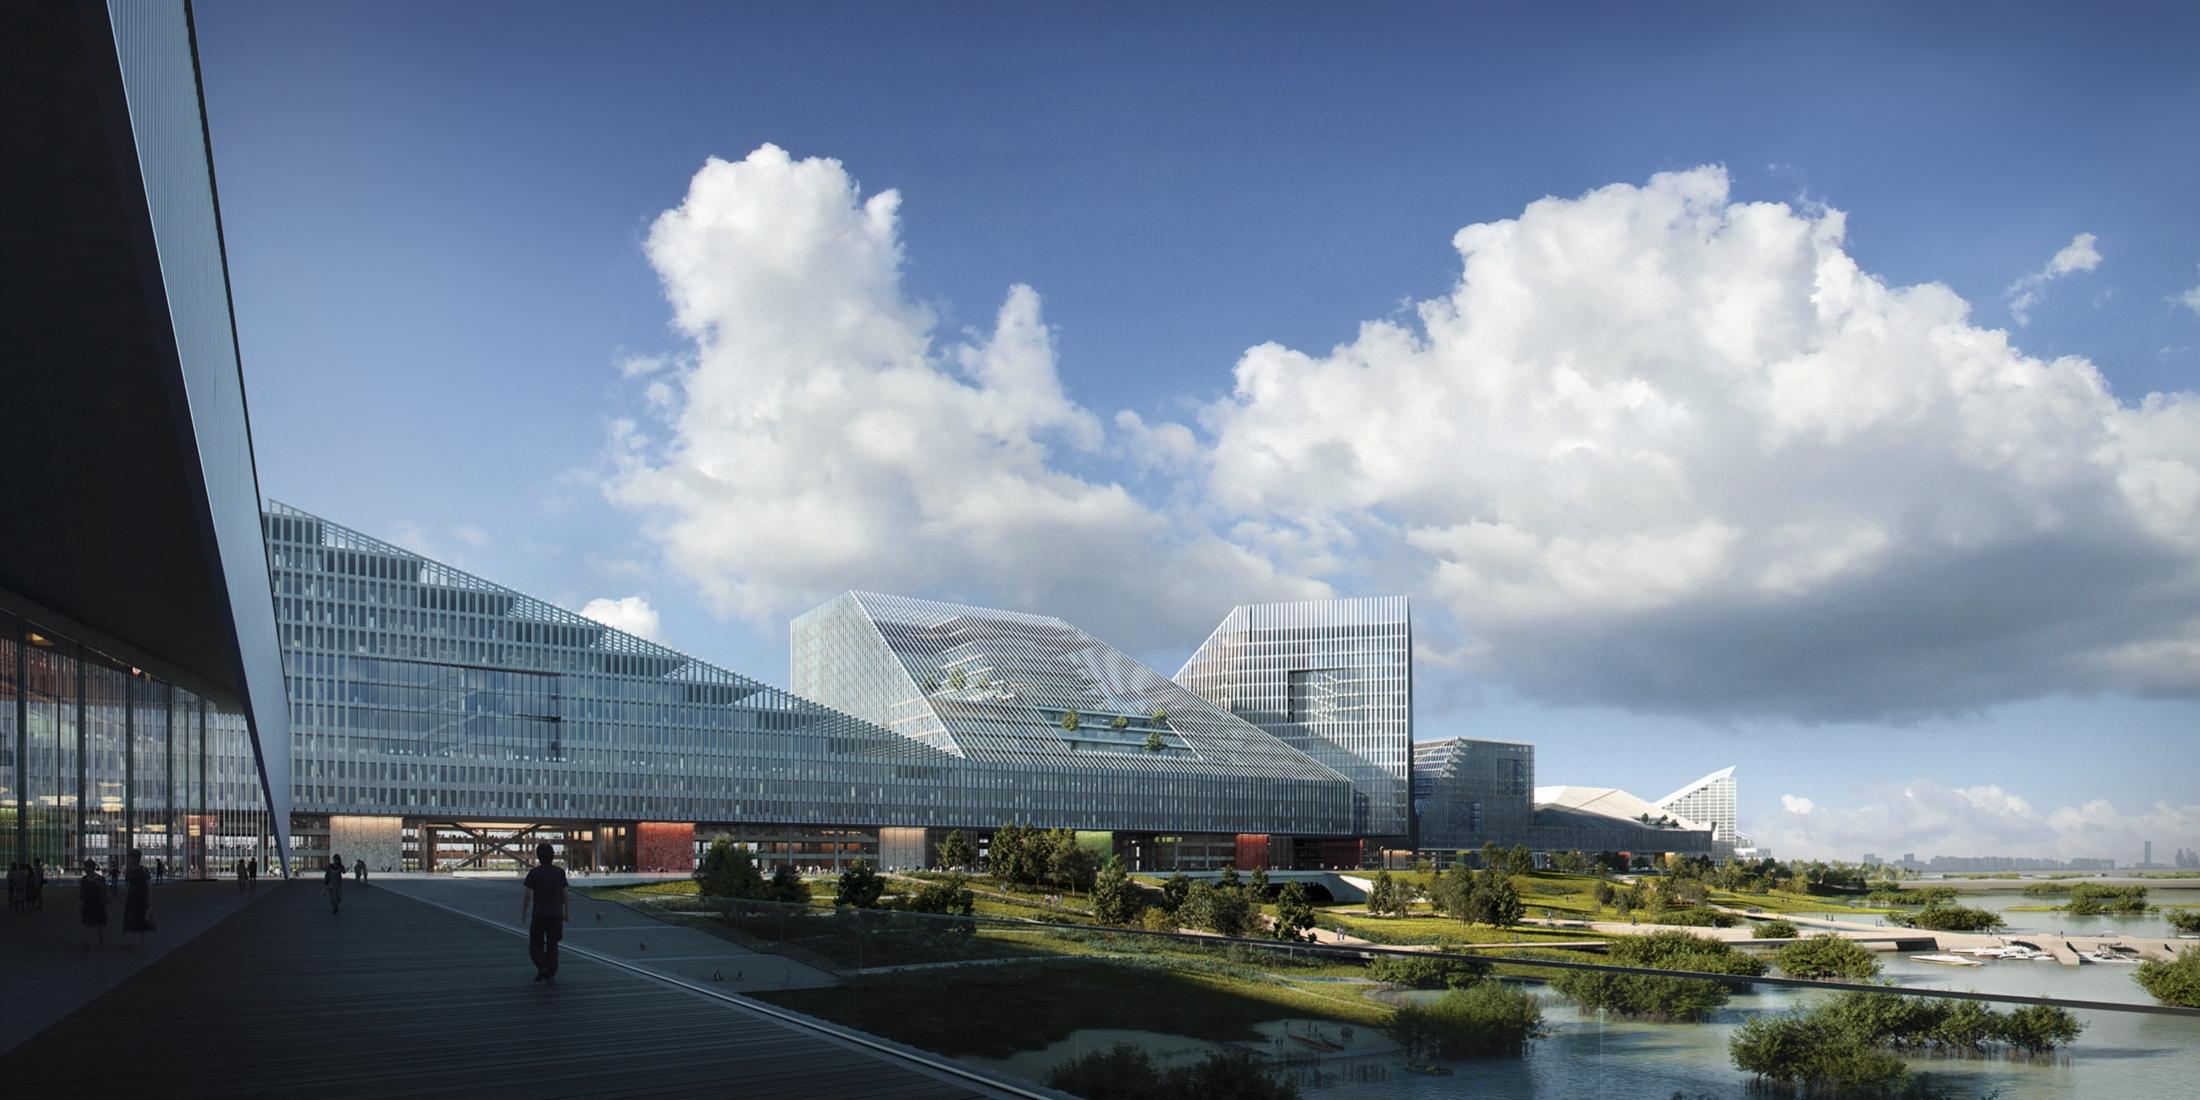 Schmidt Hammer Lassen Architects, Tencent Crystal City, China, 2018